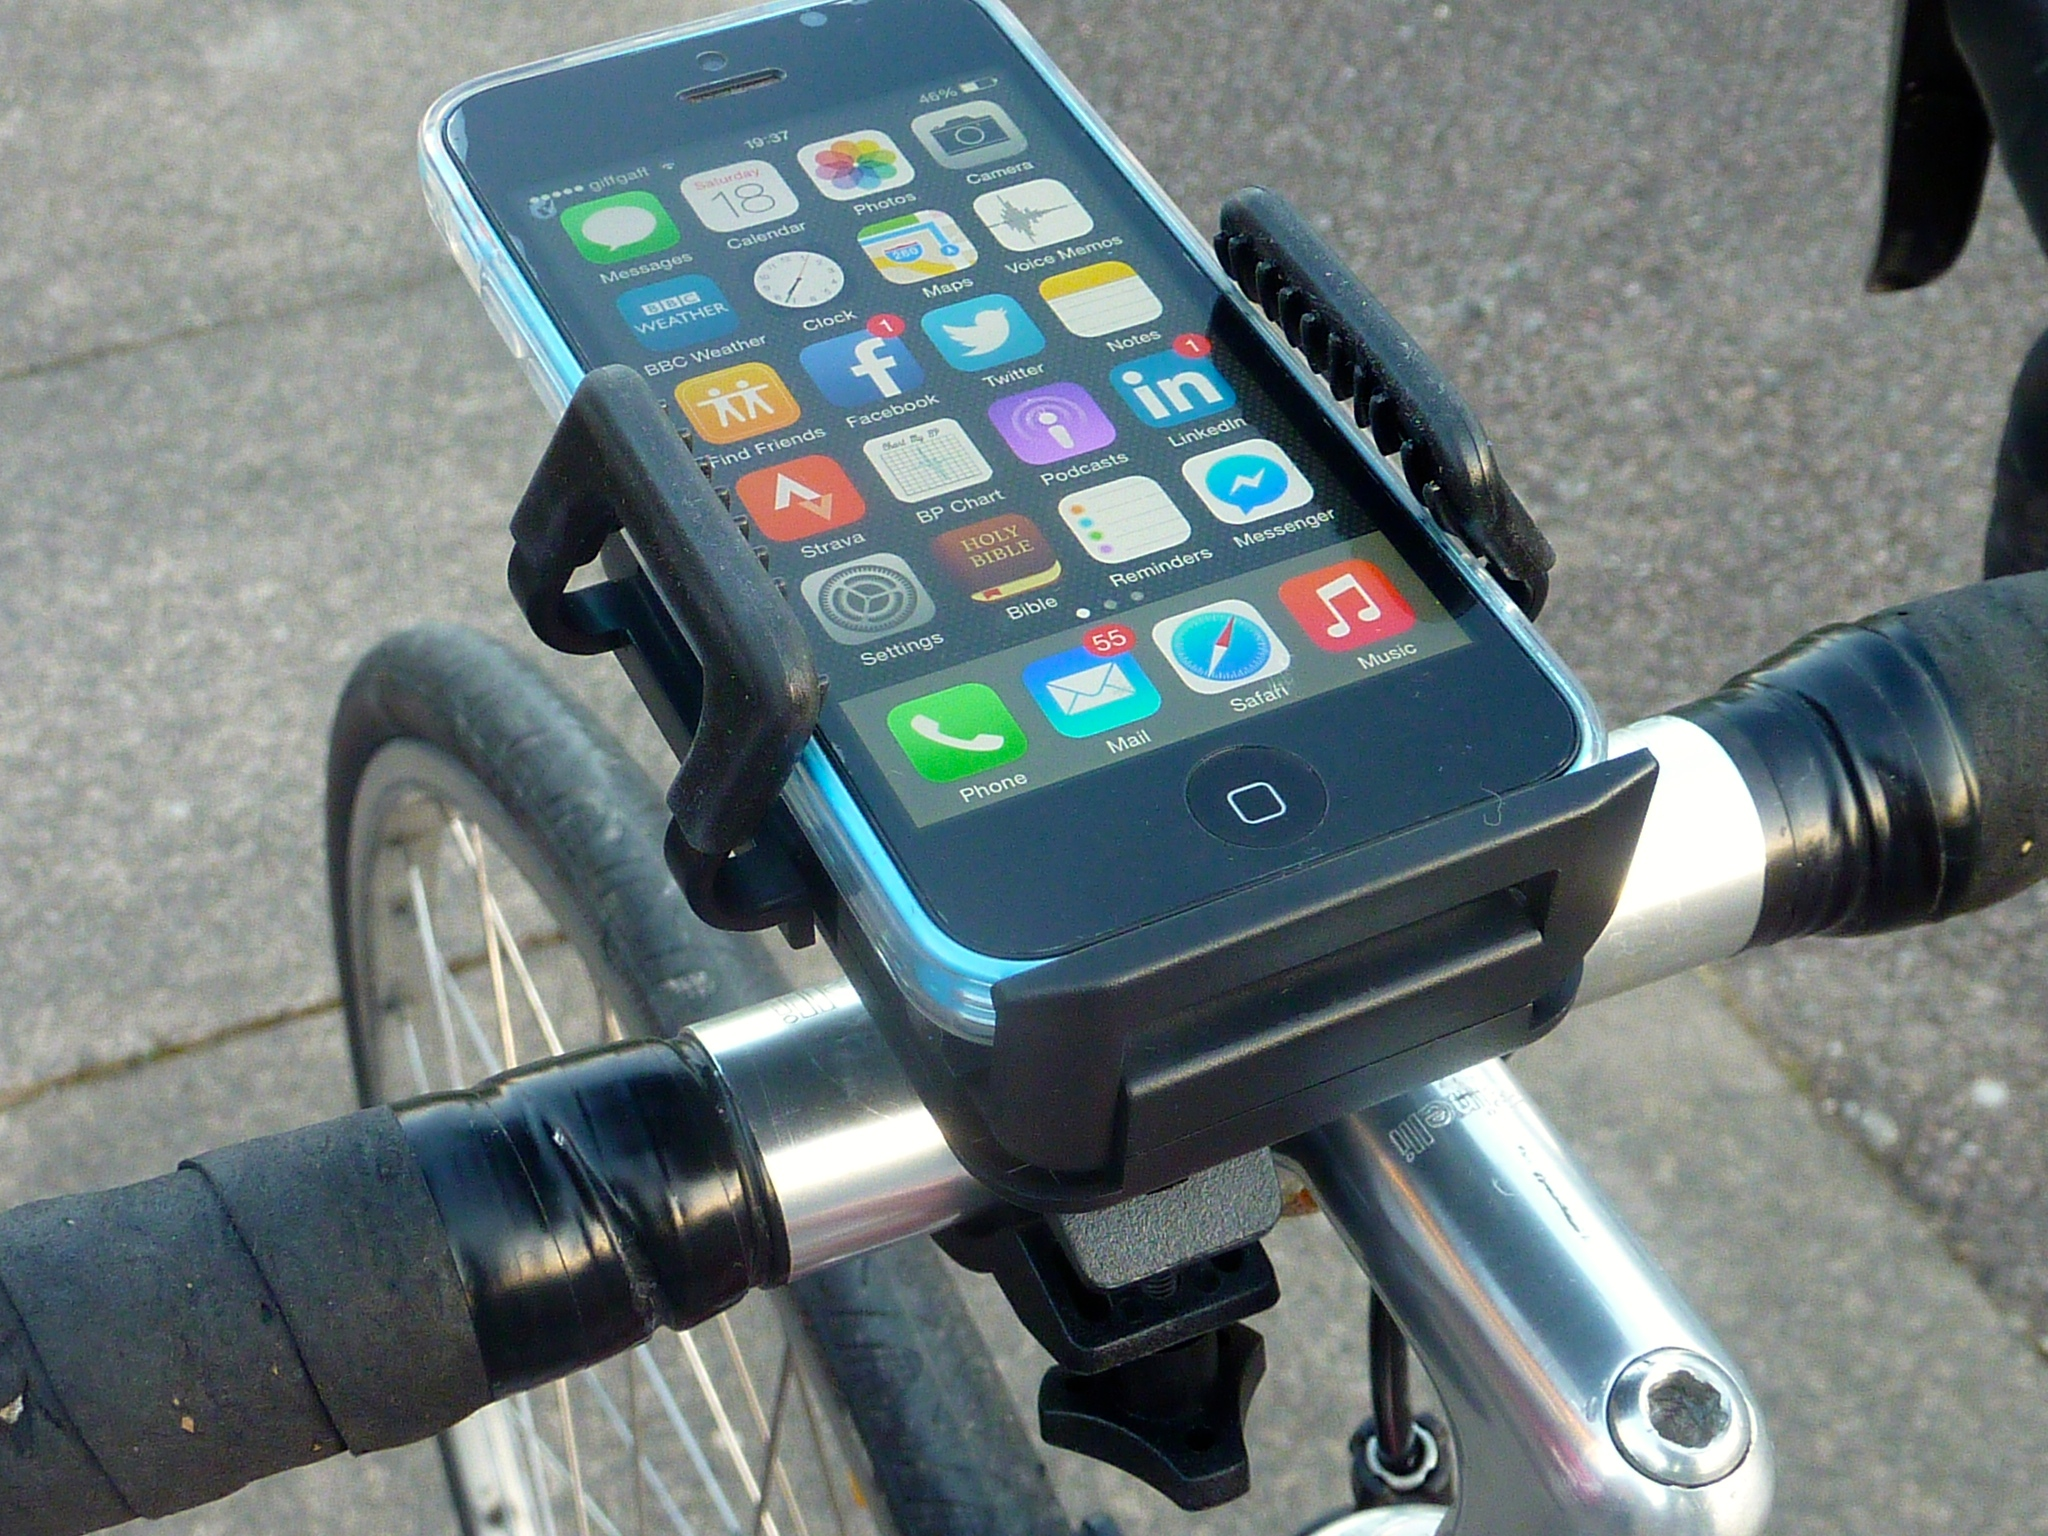 olixar universal bike phone mount 8 there